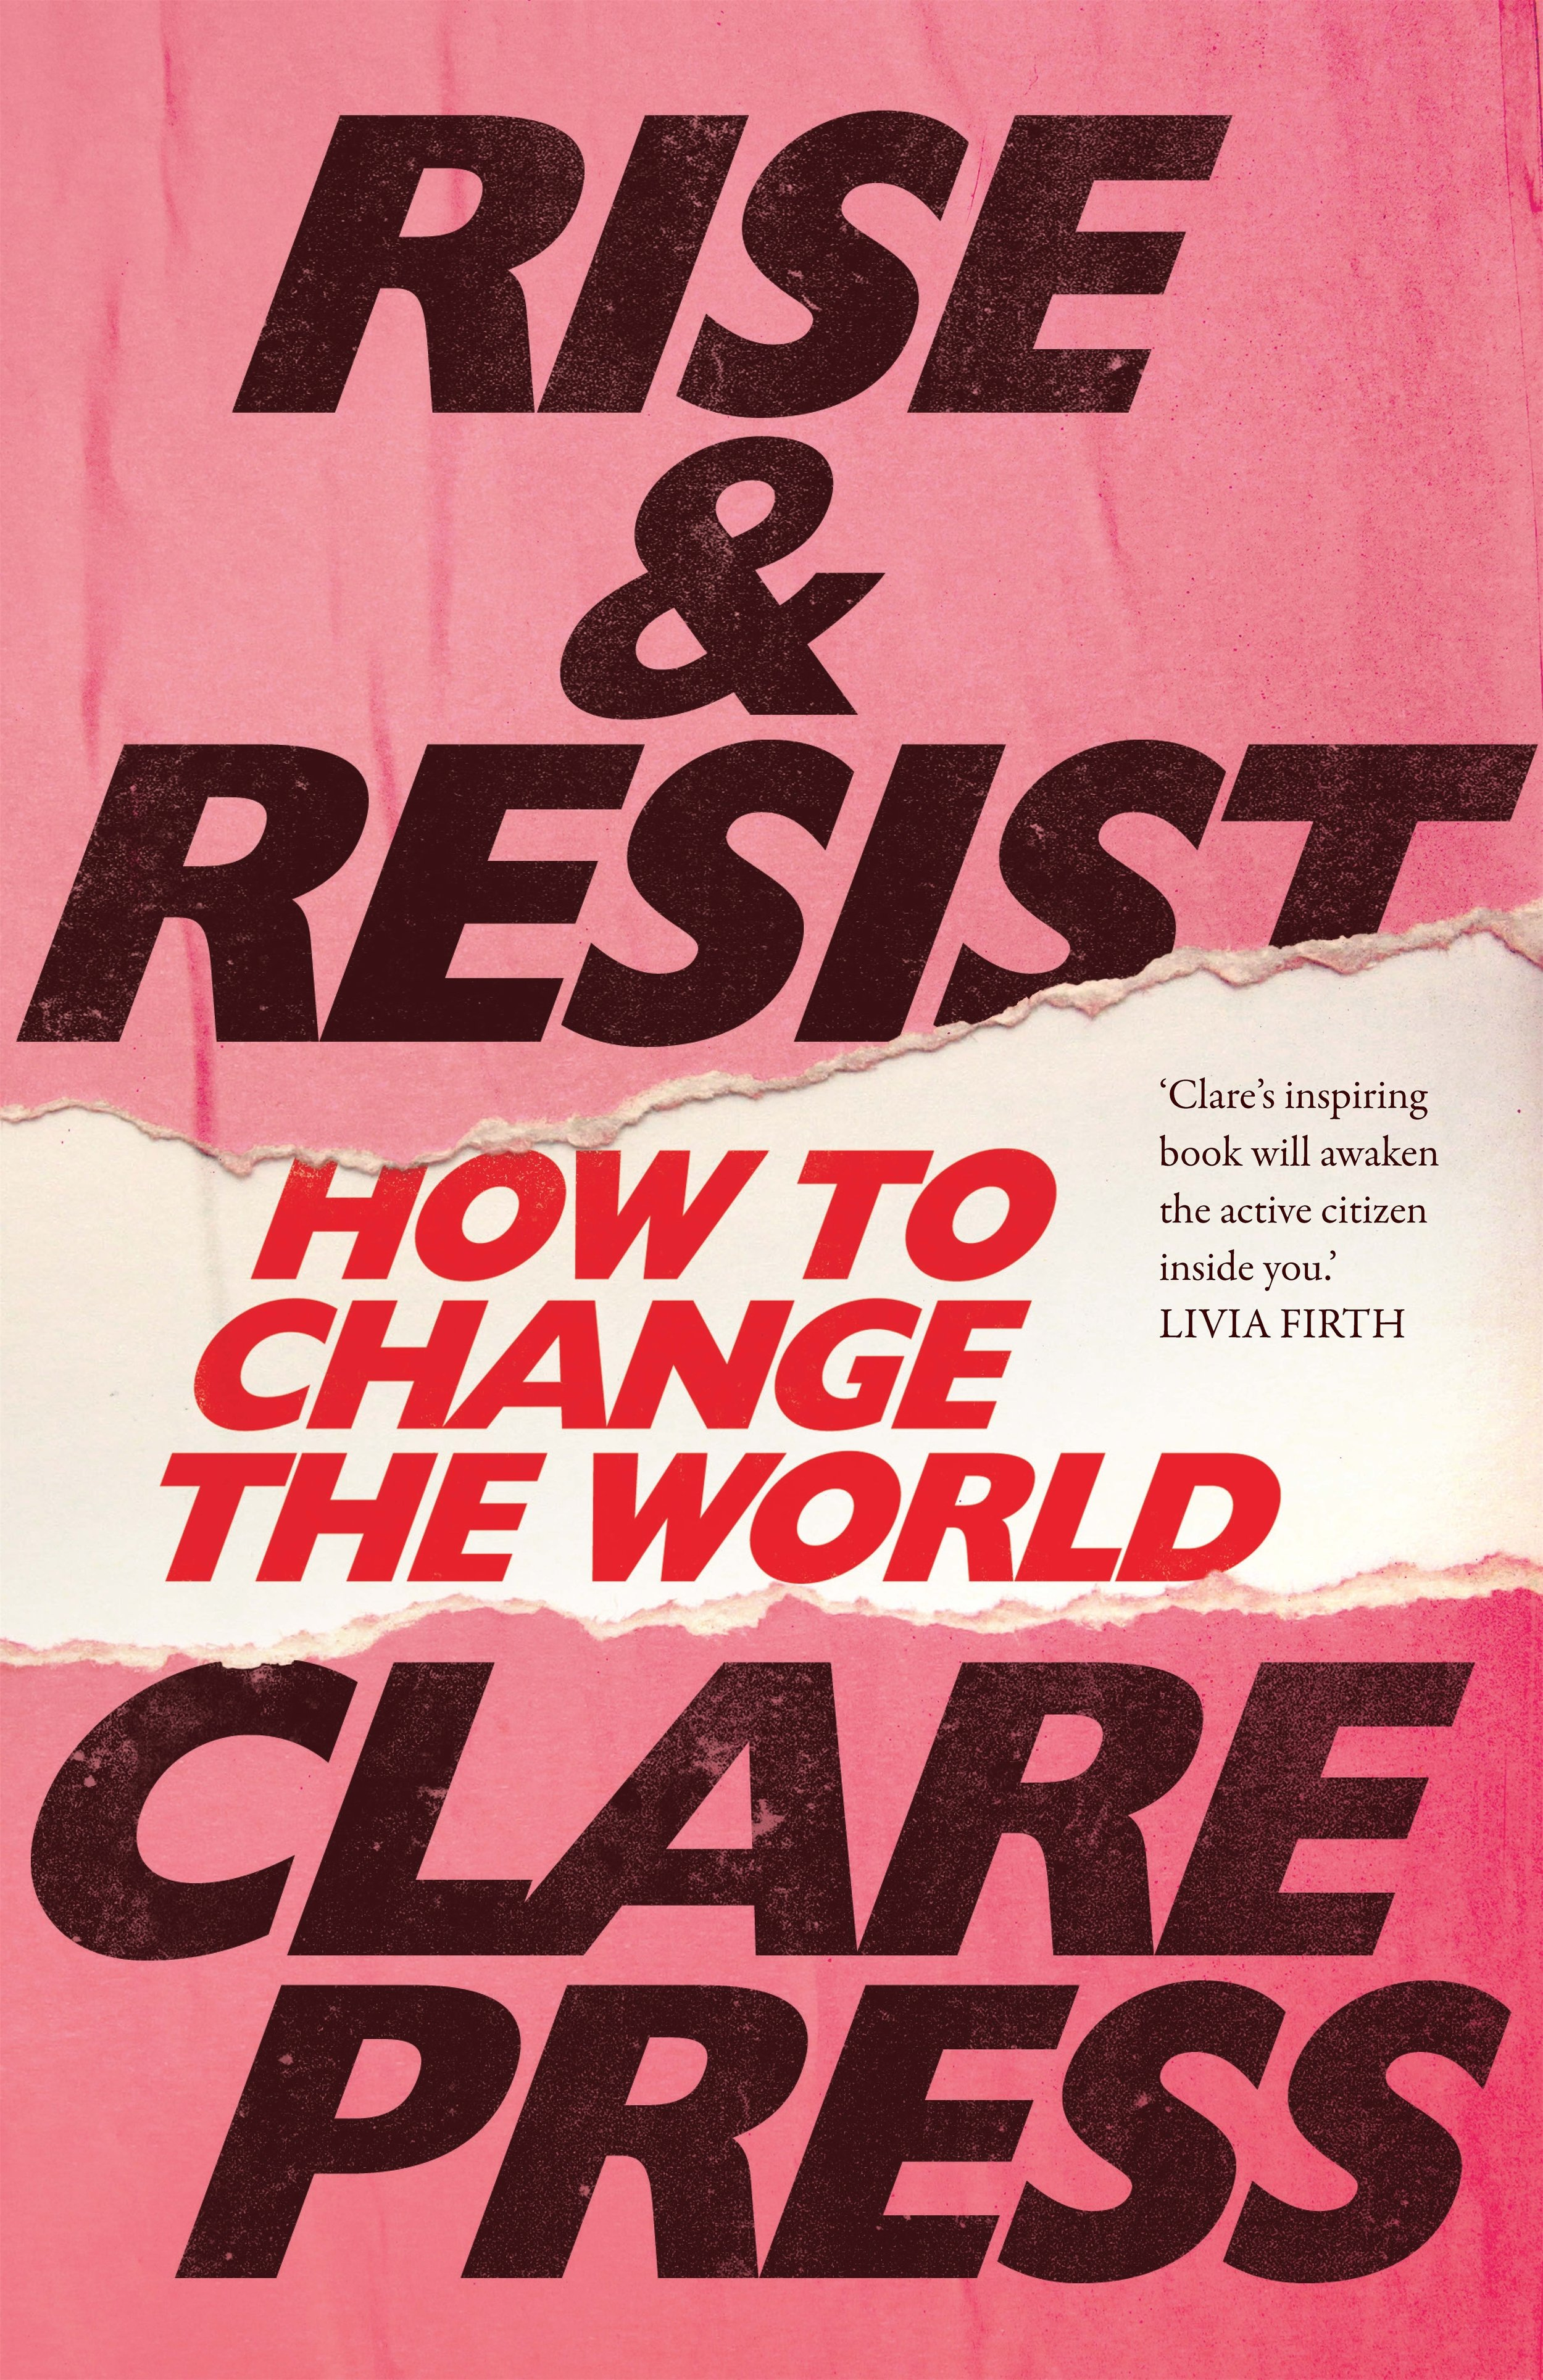 rise-resist-paperback-softback120180813-4-ne1ekd.jpg